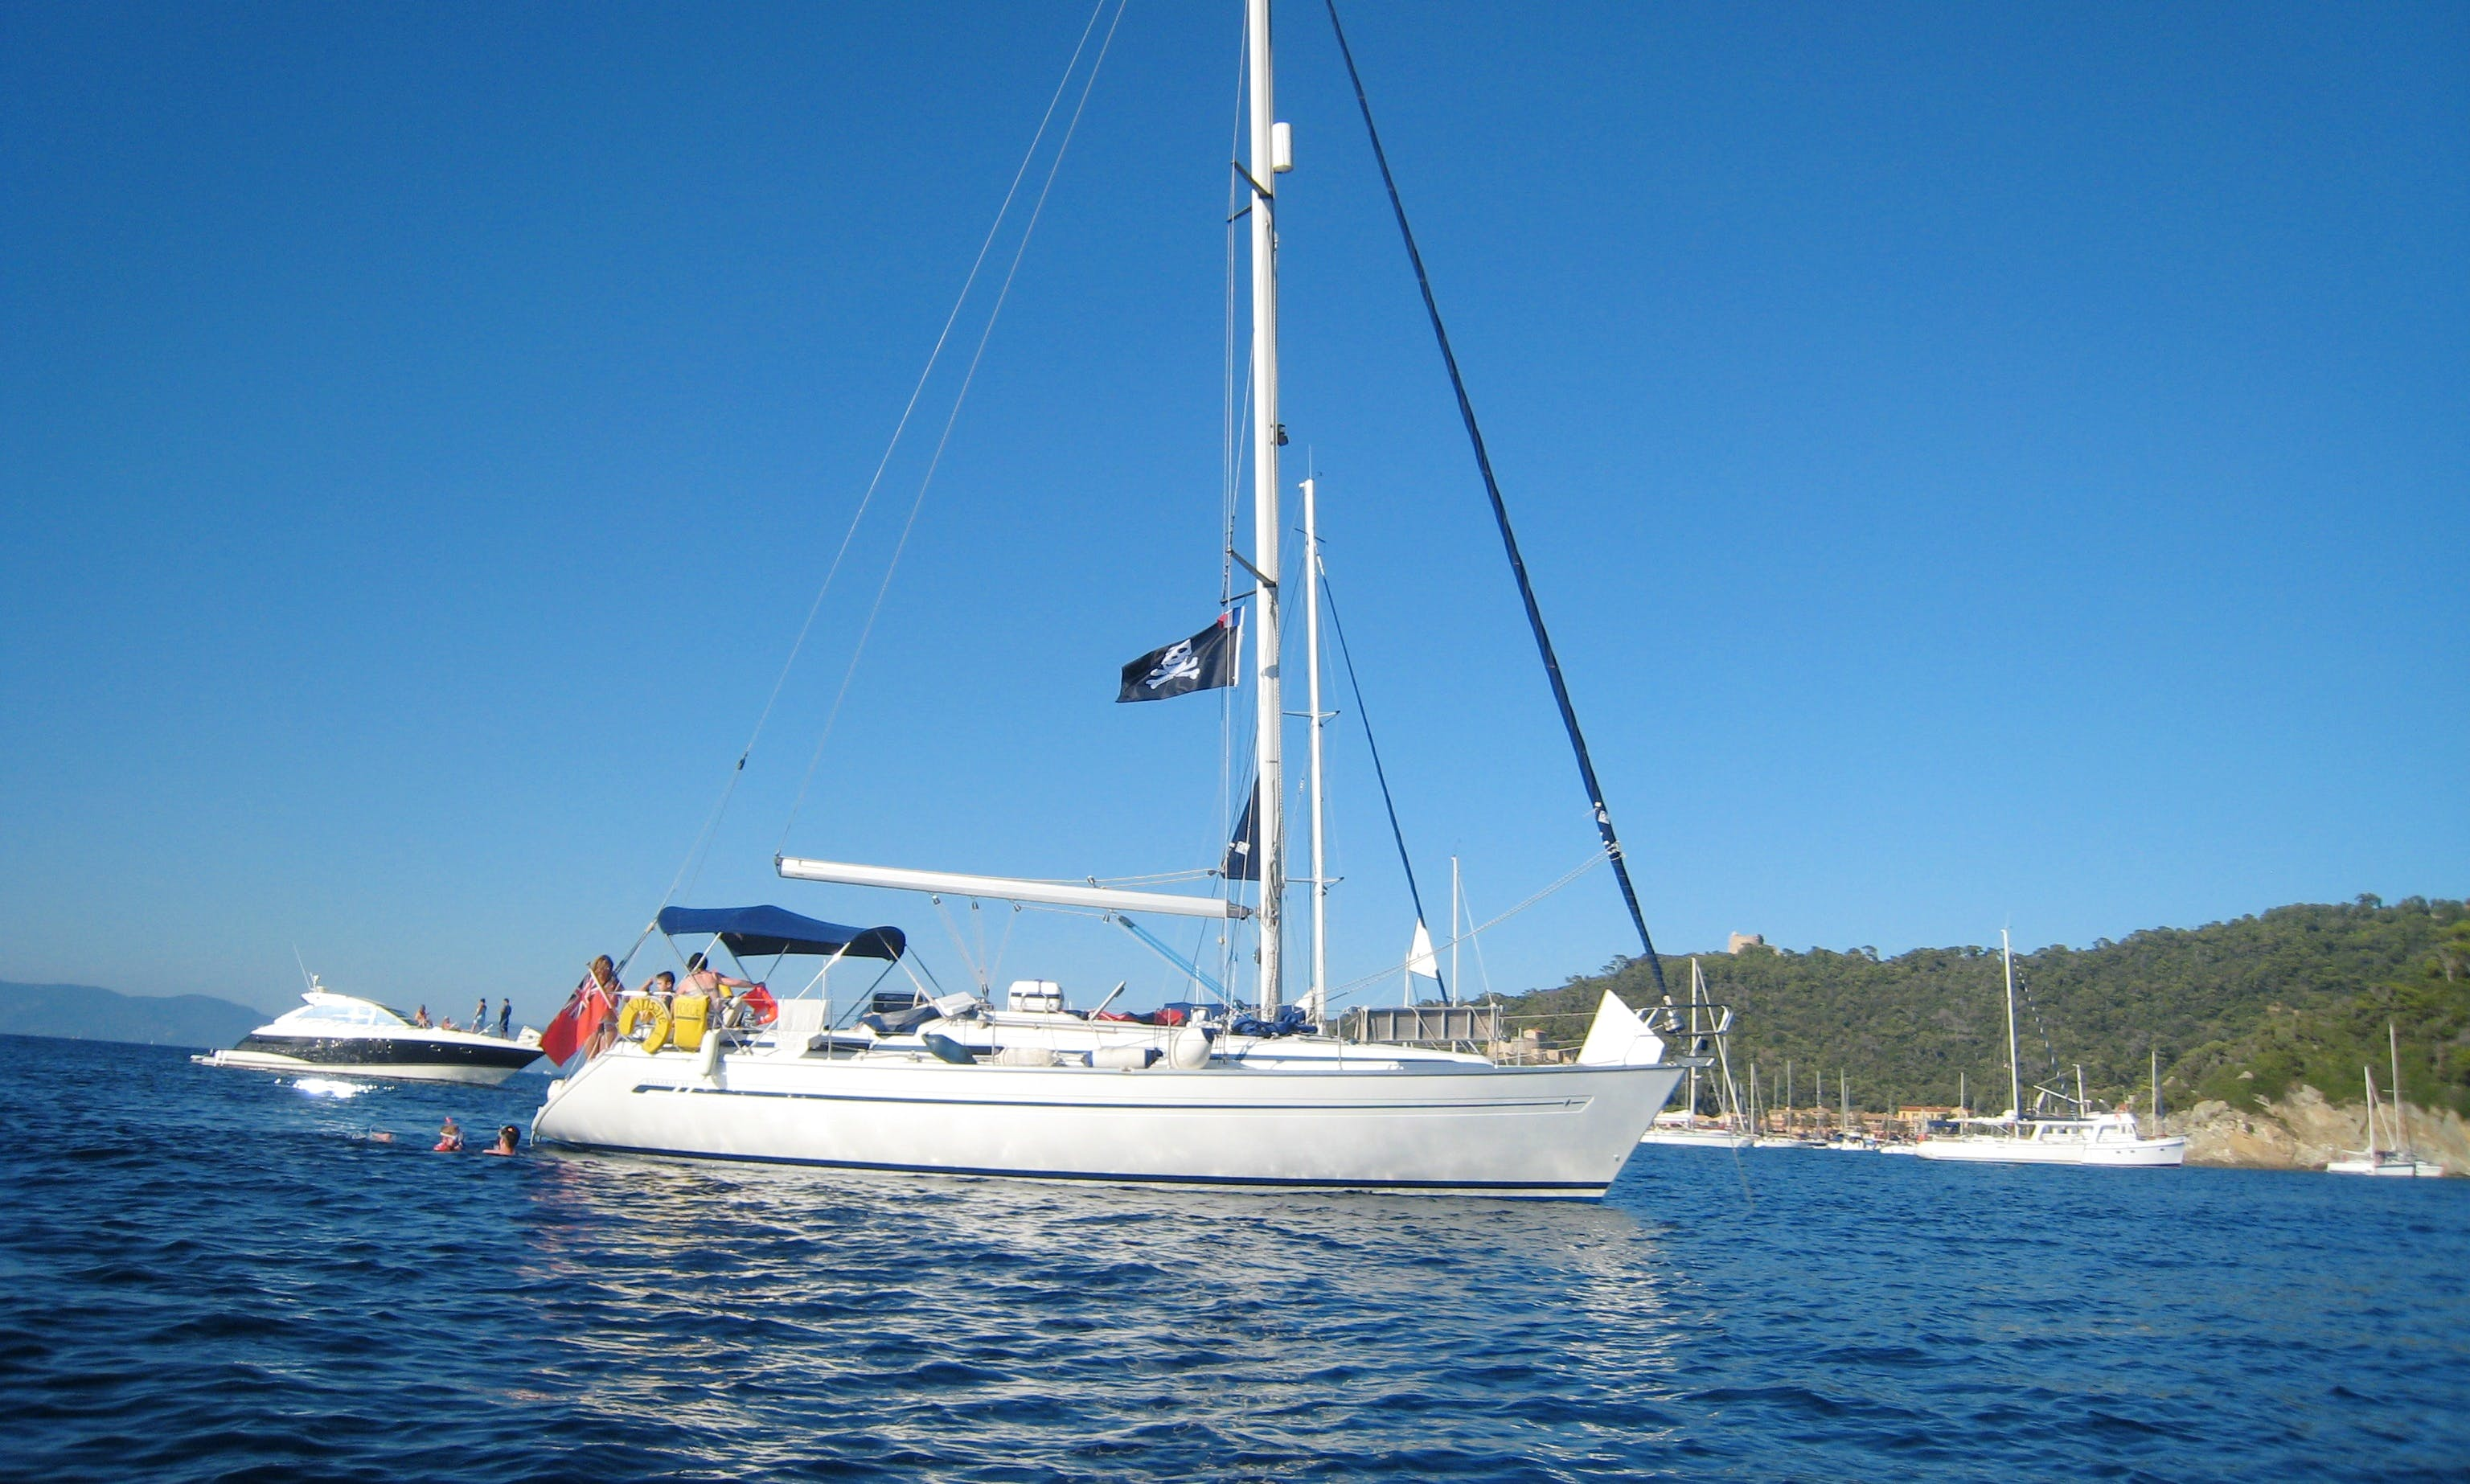 Skippered Sailing Yacht Rental in Bormes-les-Mimosas, France